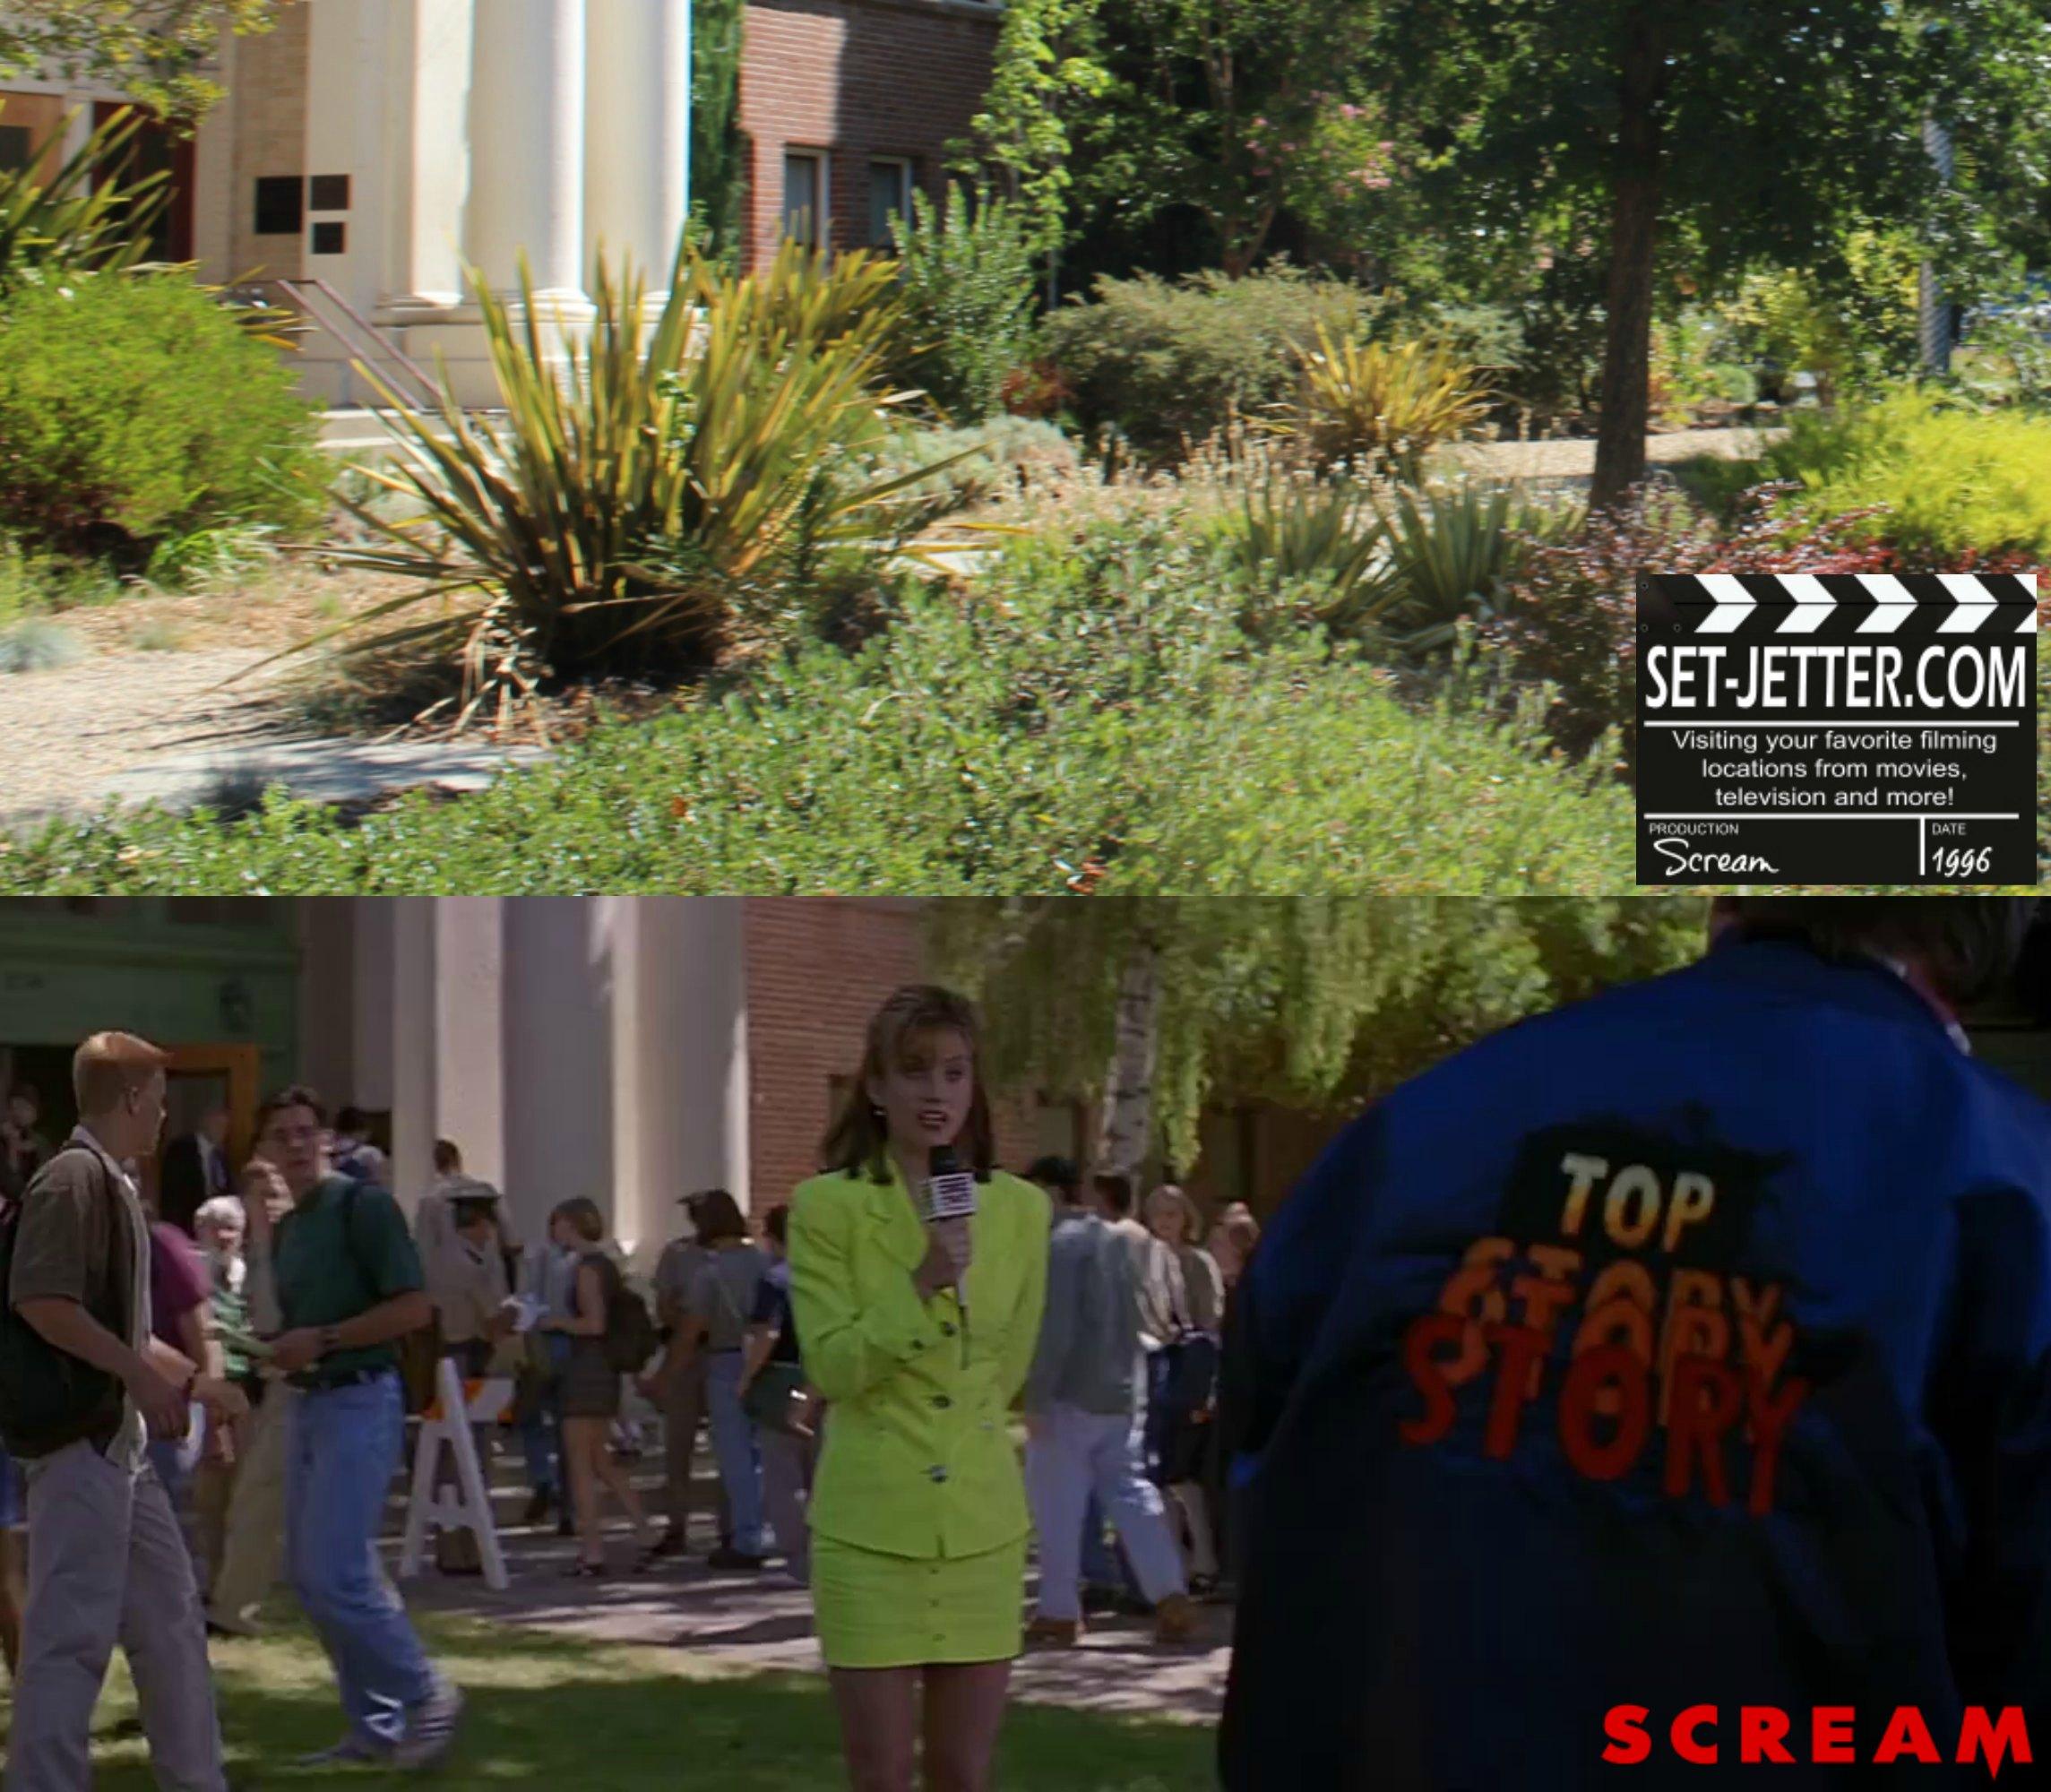 Scream comparison 11.jpg